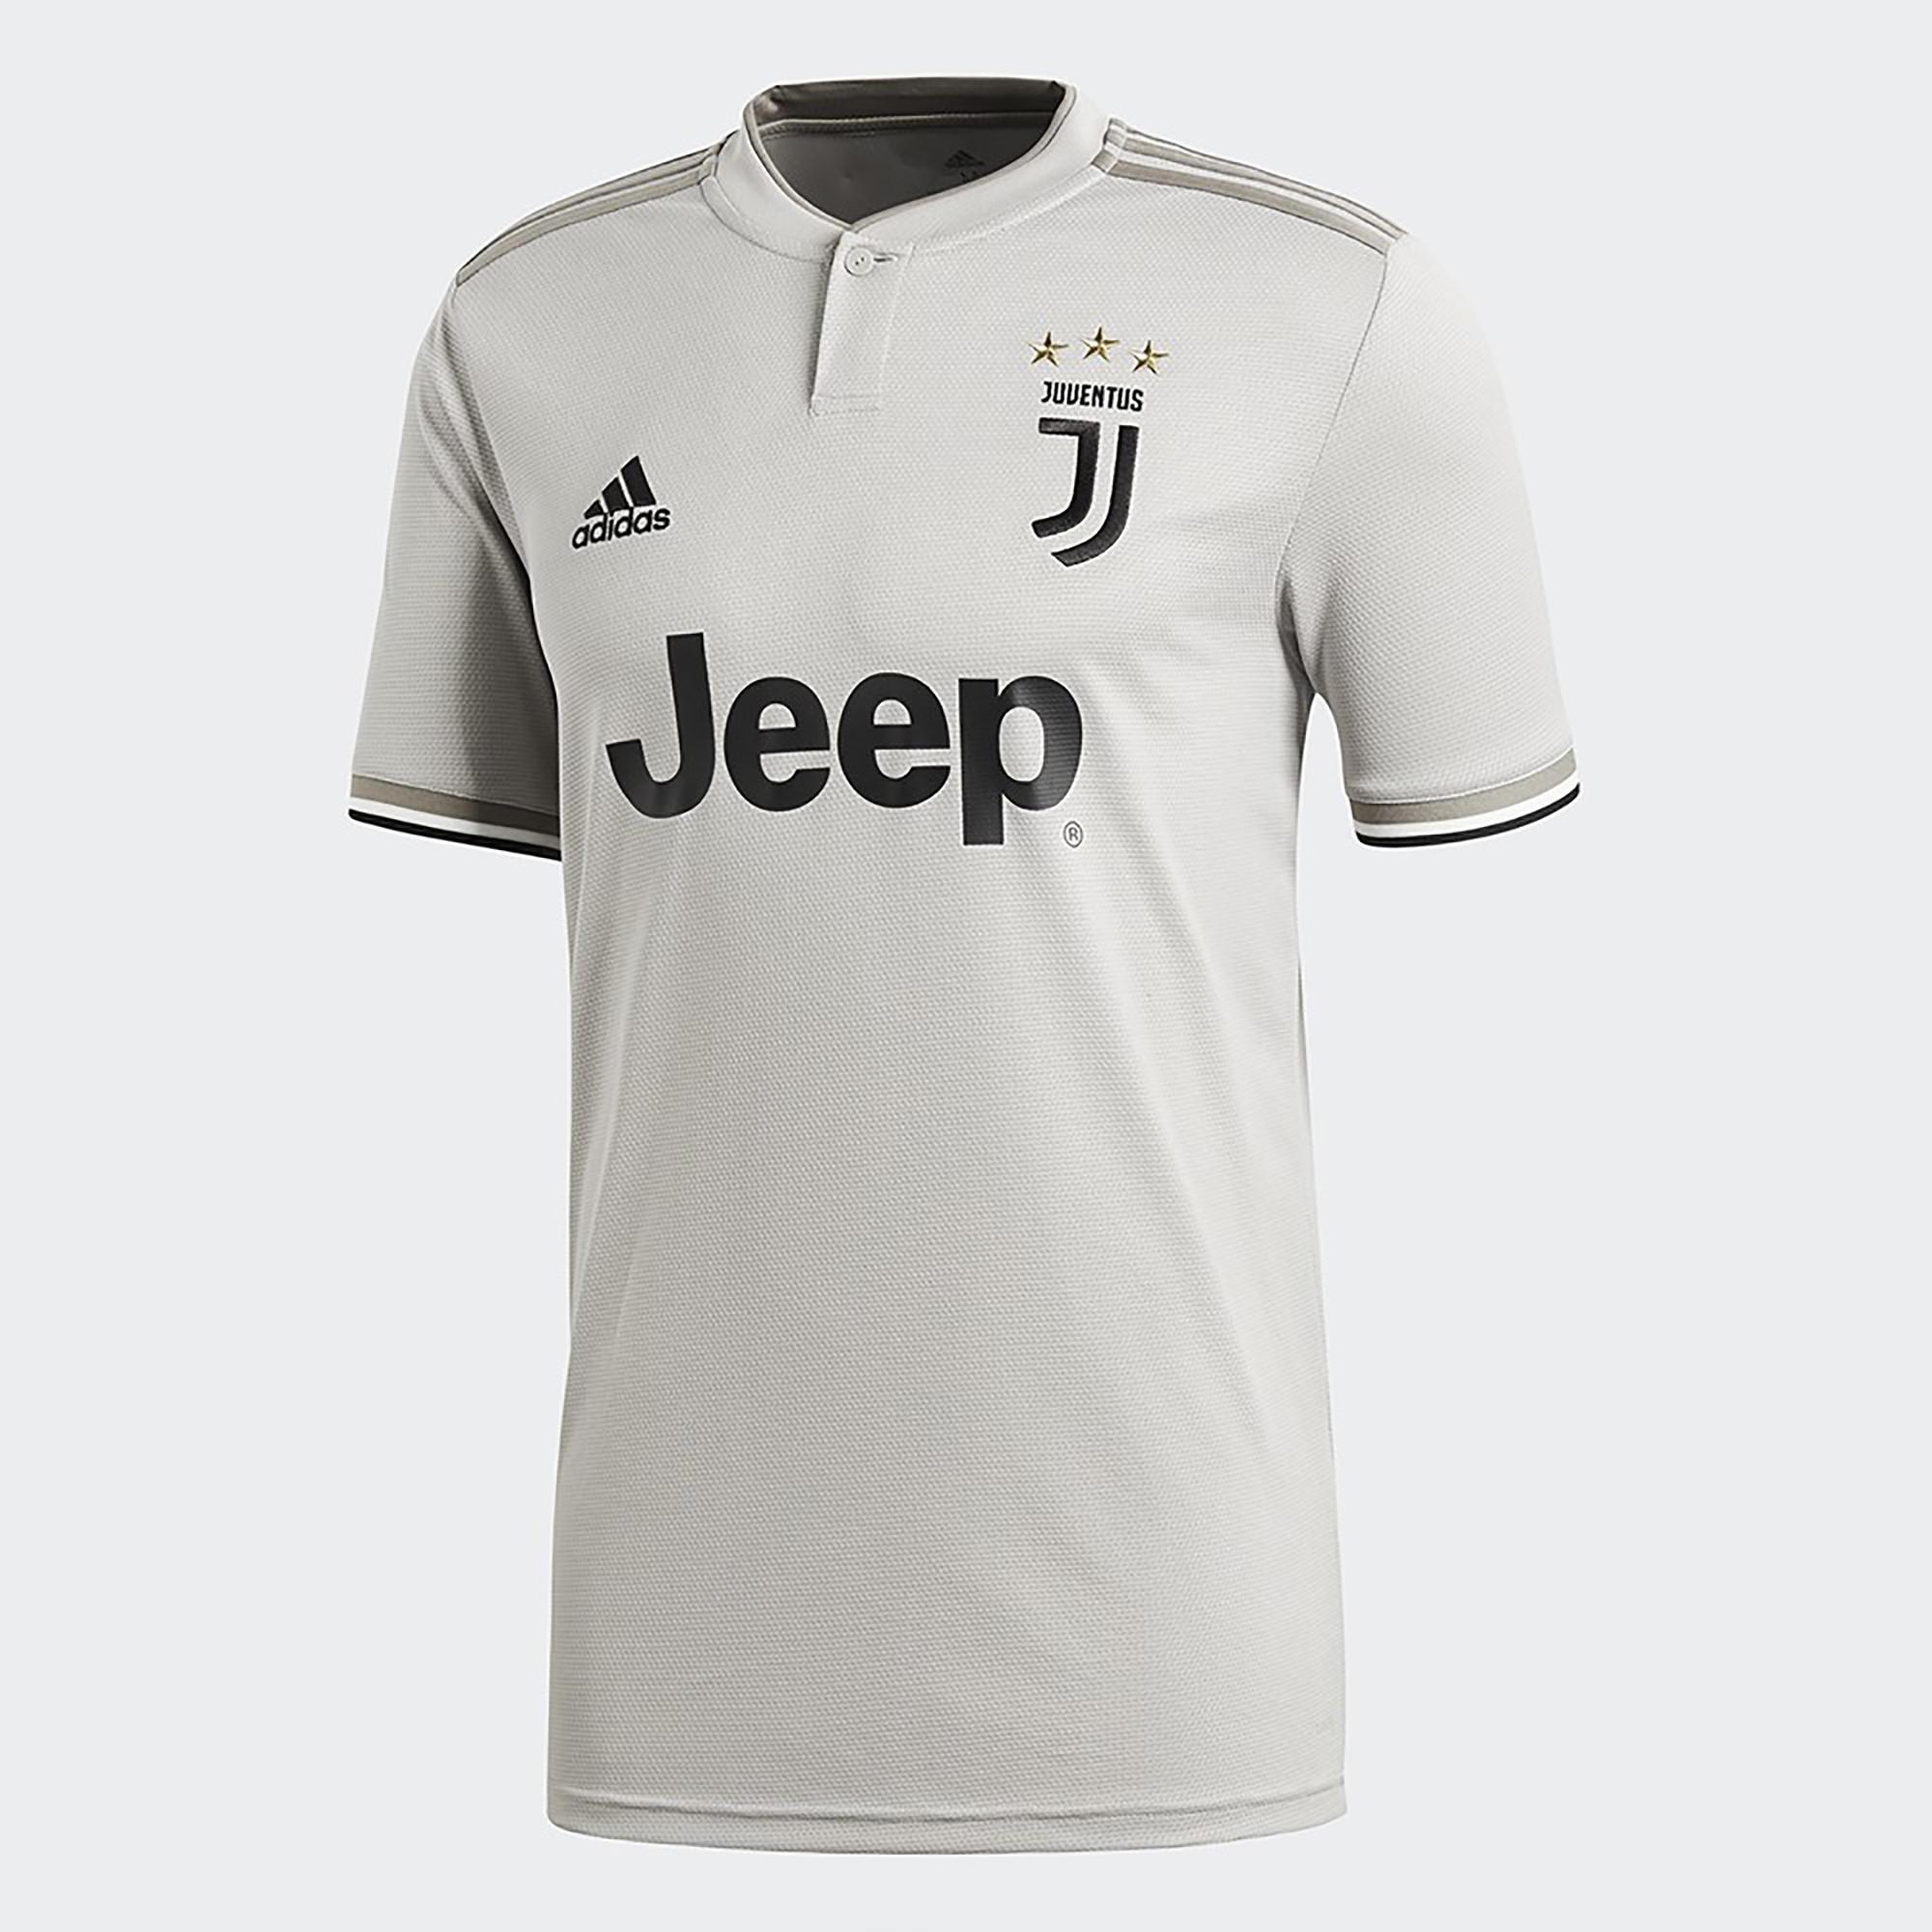 Camiseta de fútbol júnior Juventus de Turín visitante 2018 2019 Adidas  77921fc7eb53d